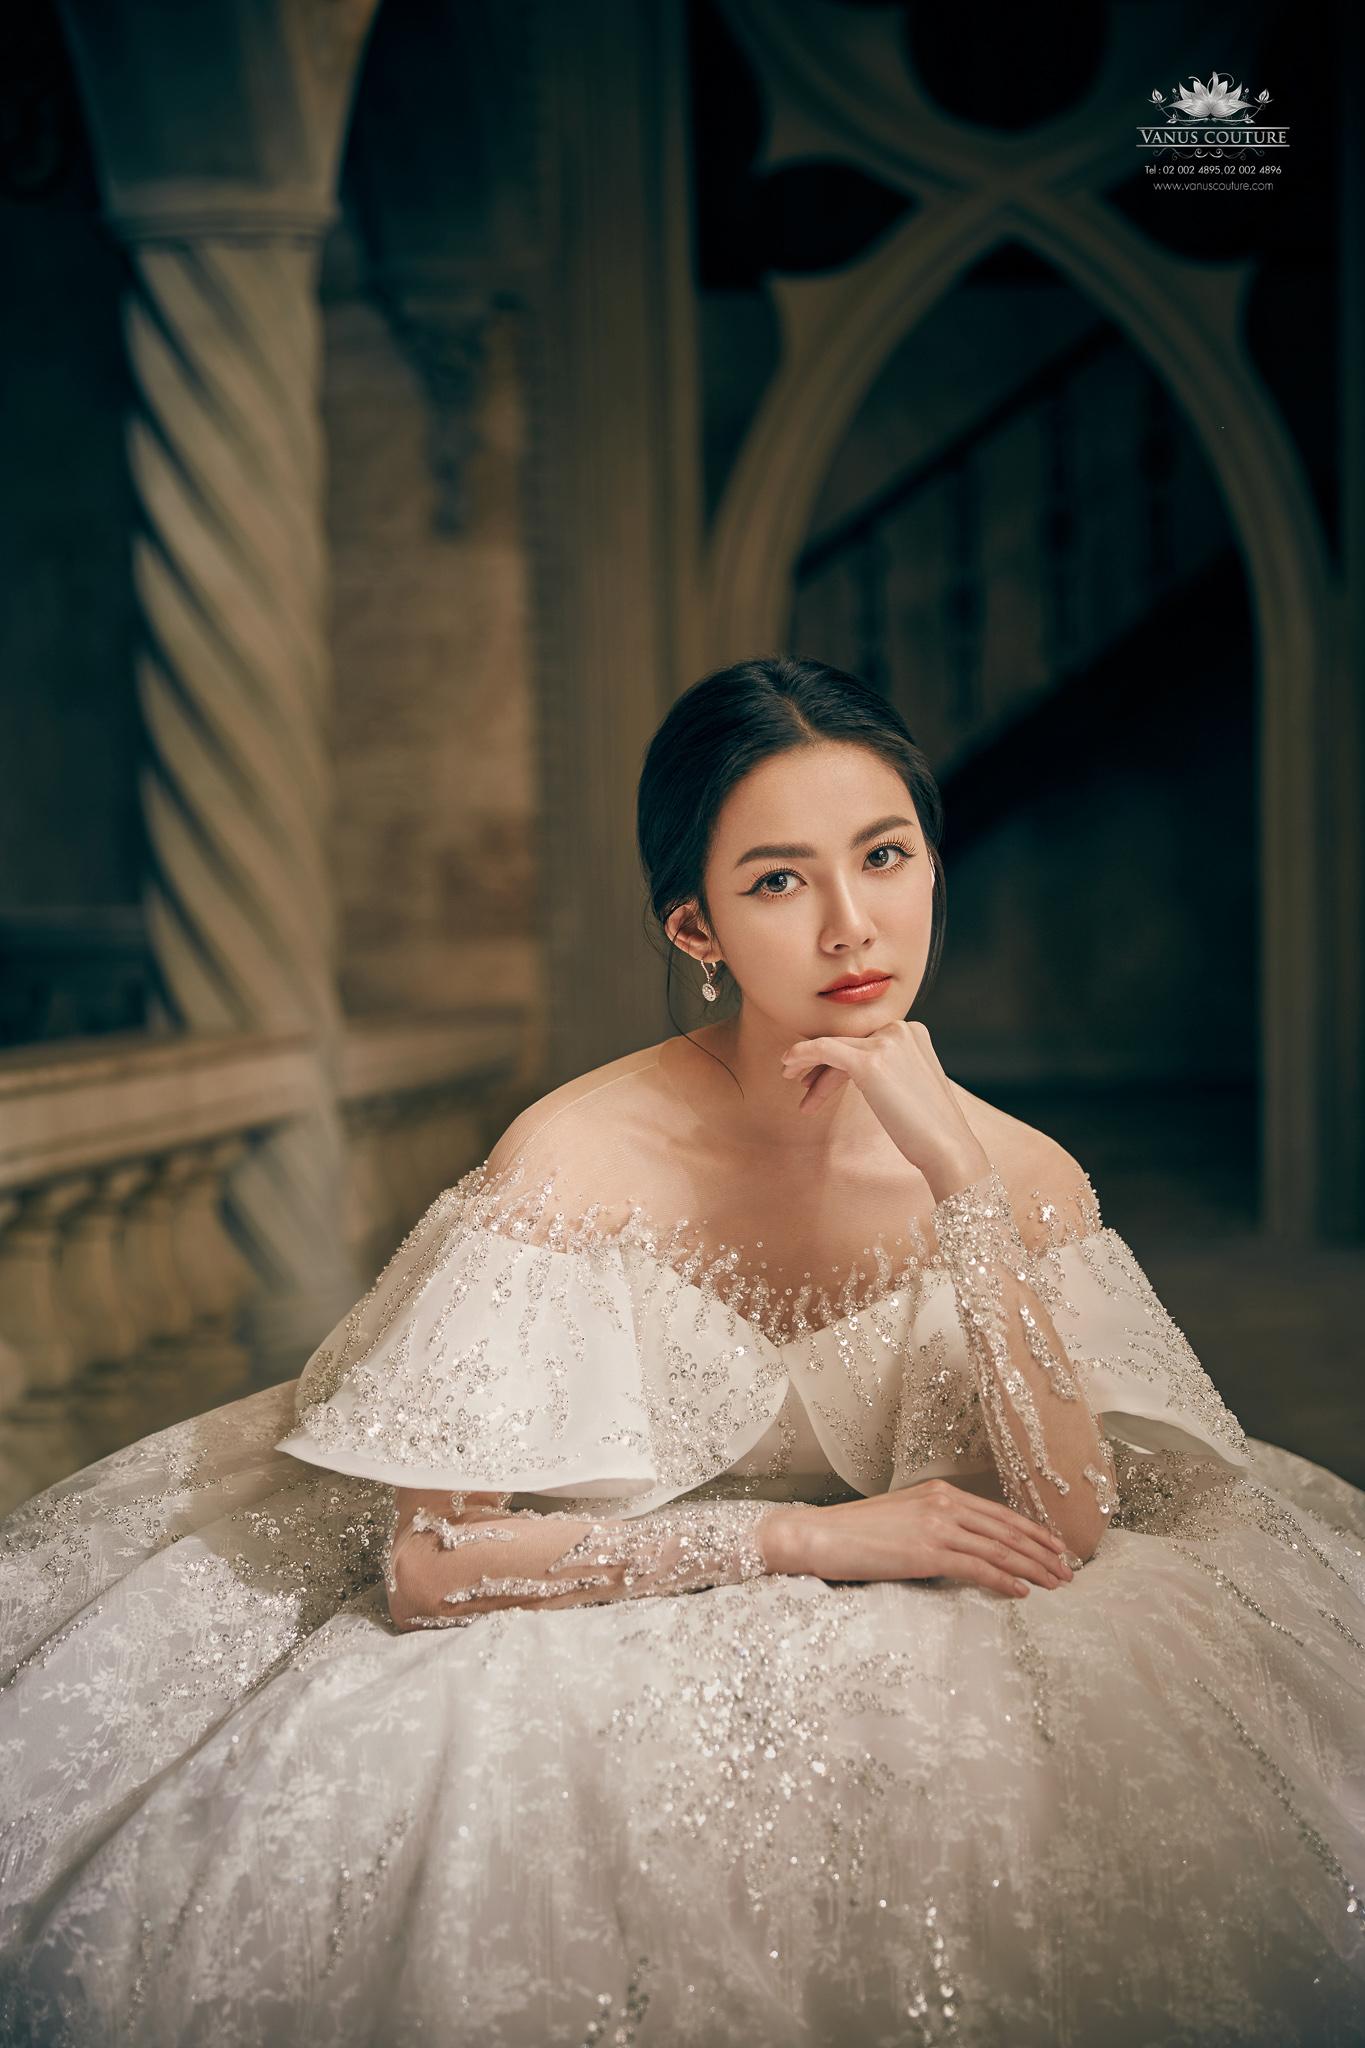 Superball wedding dress - Gybzy 07